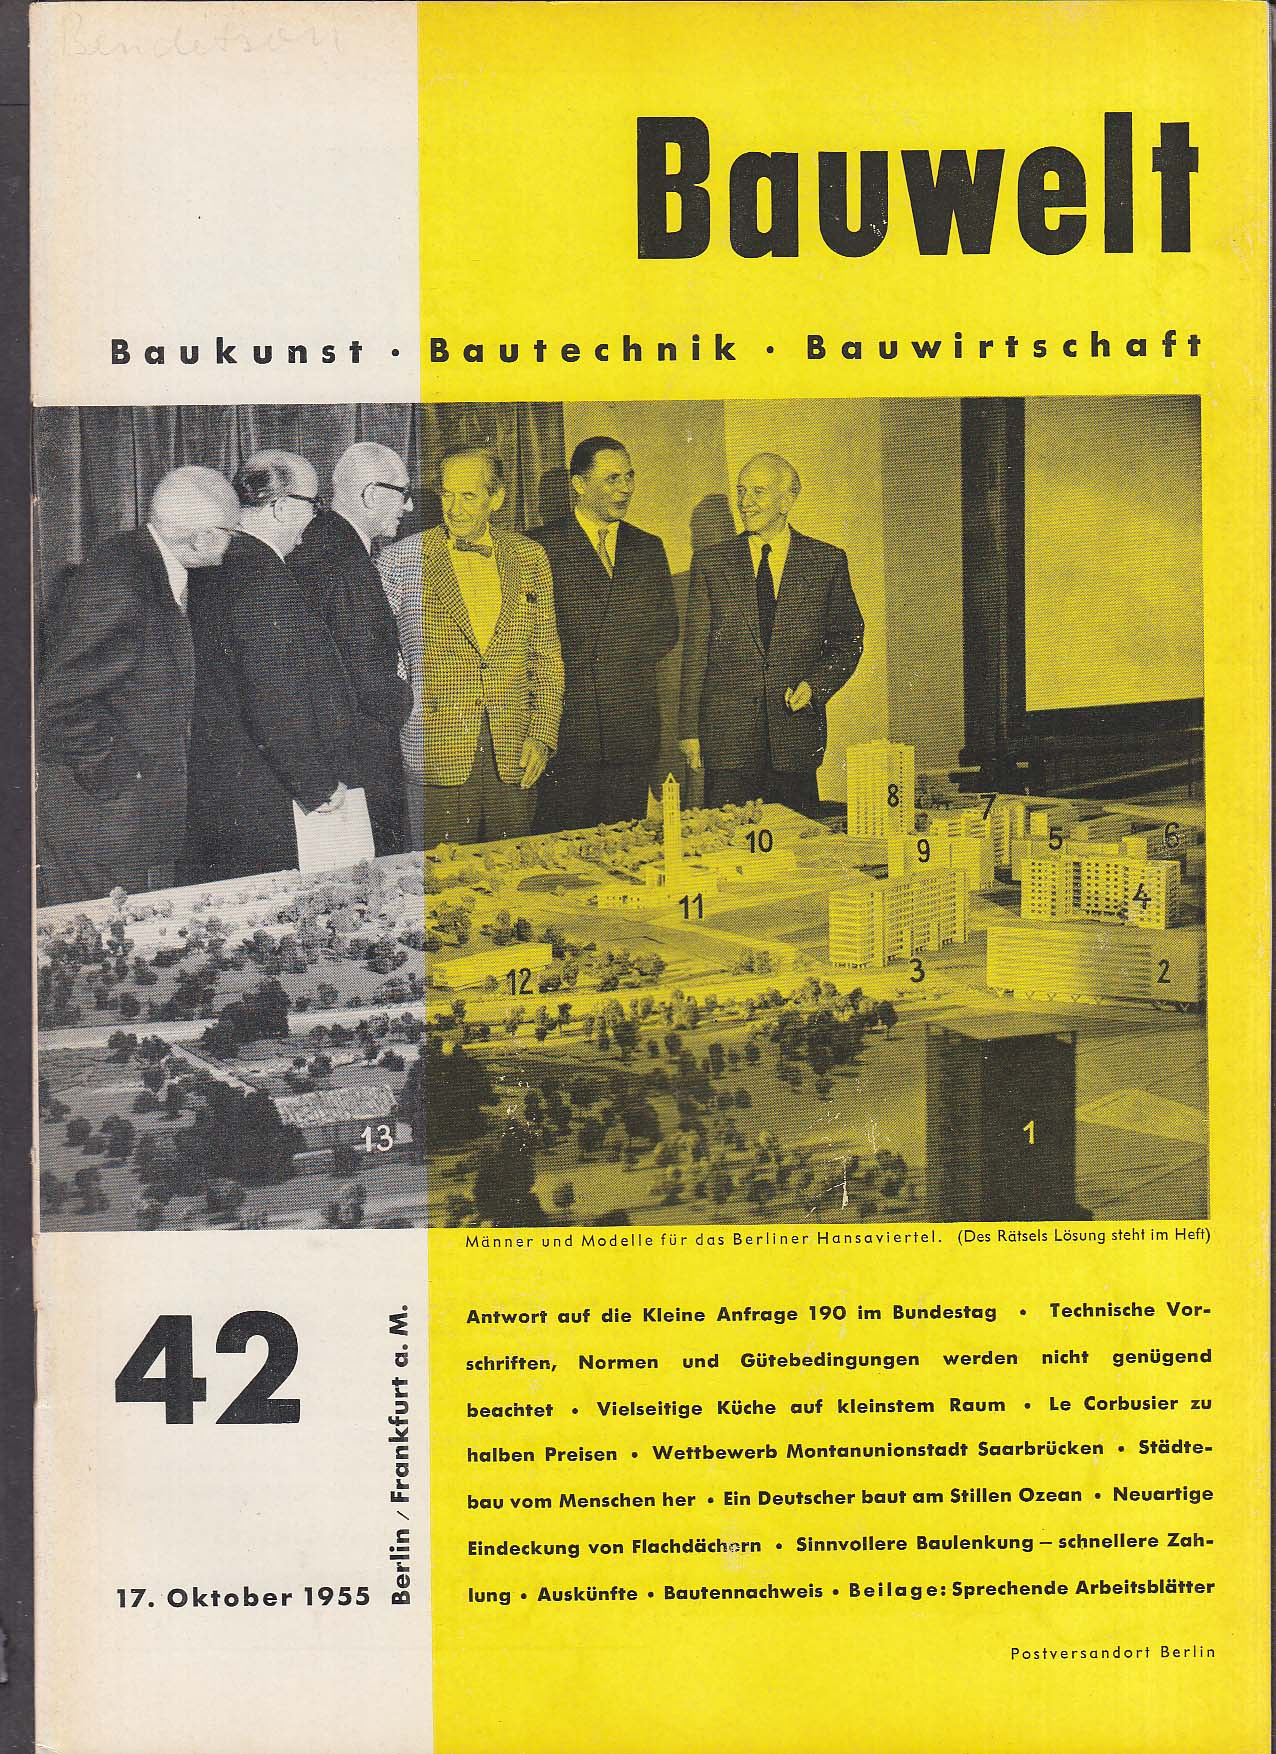 Bauwelt German architecture magazine 10/17/1955 42